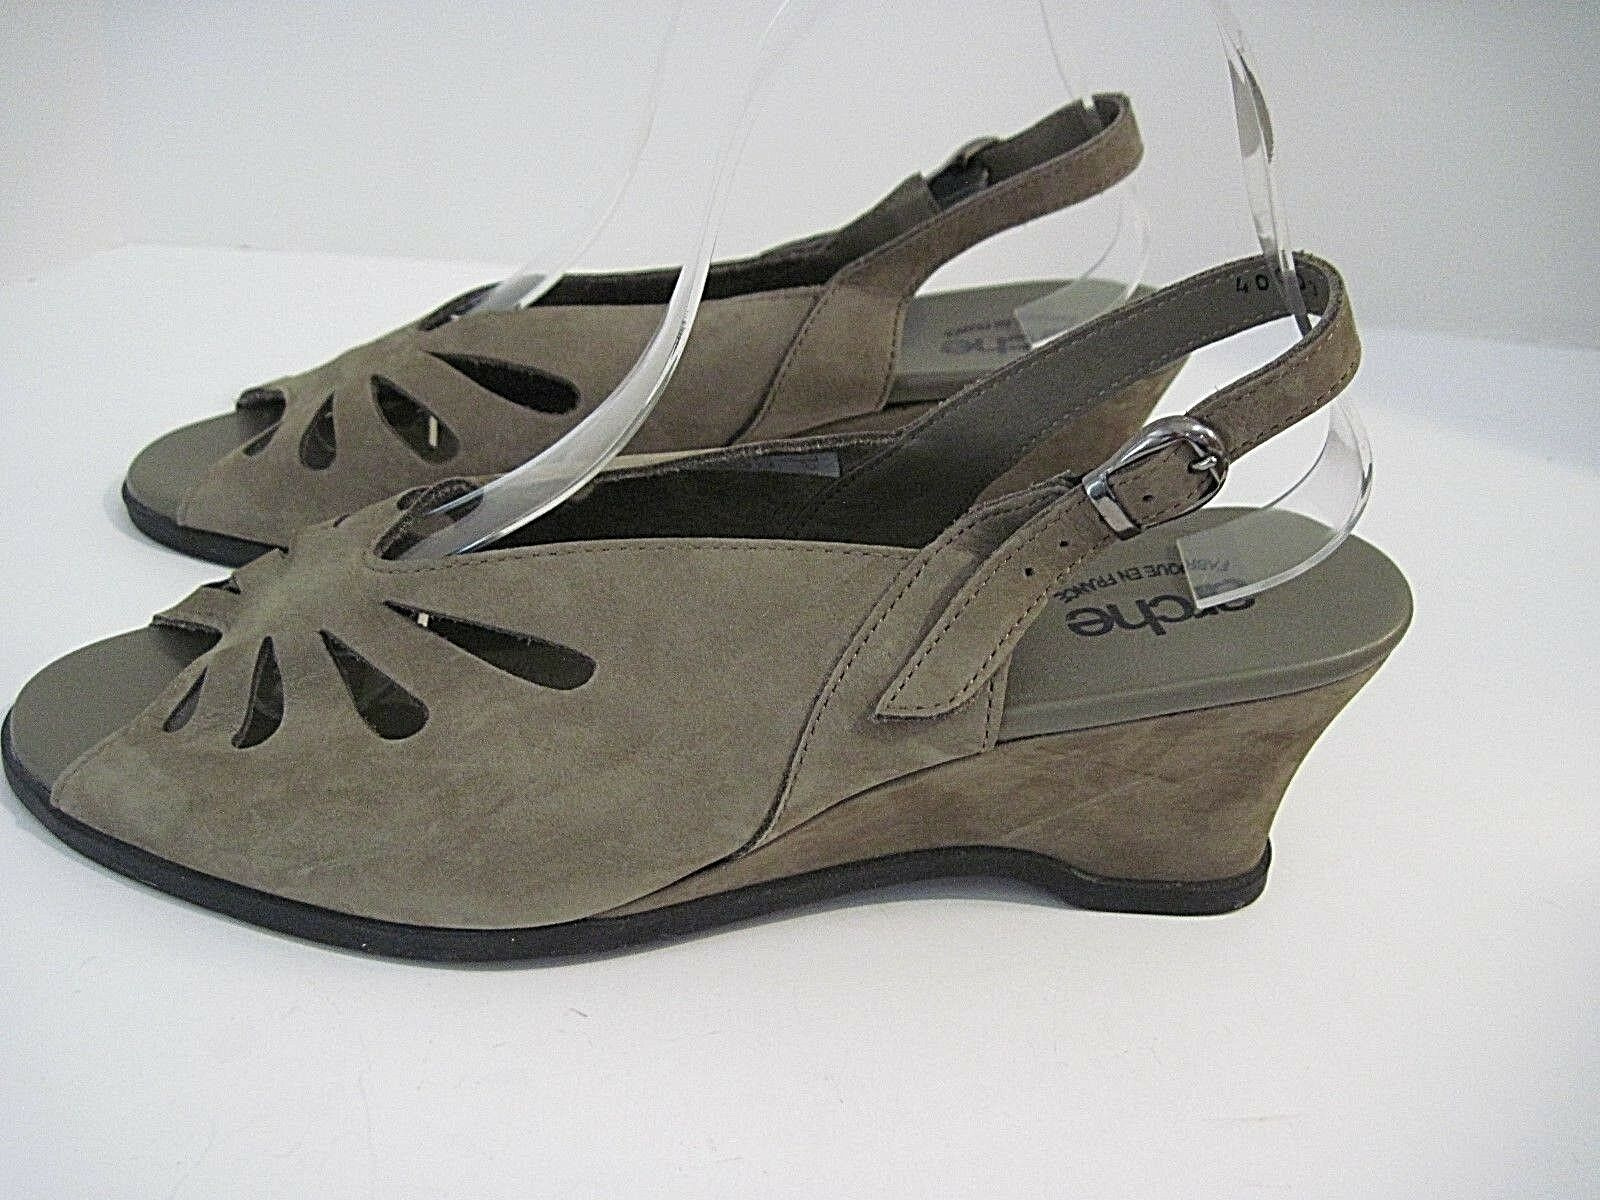 produttori fornitura diretta Arche Taupe Nubuck Slingback Peep Toe Toe Toe Wedge scarpe Sz 40  a prezzi accessibili